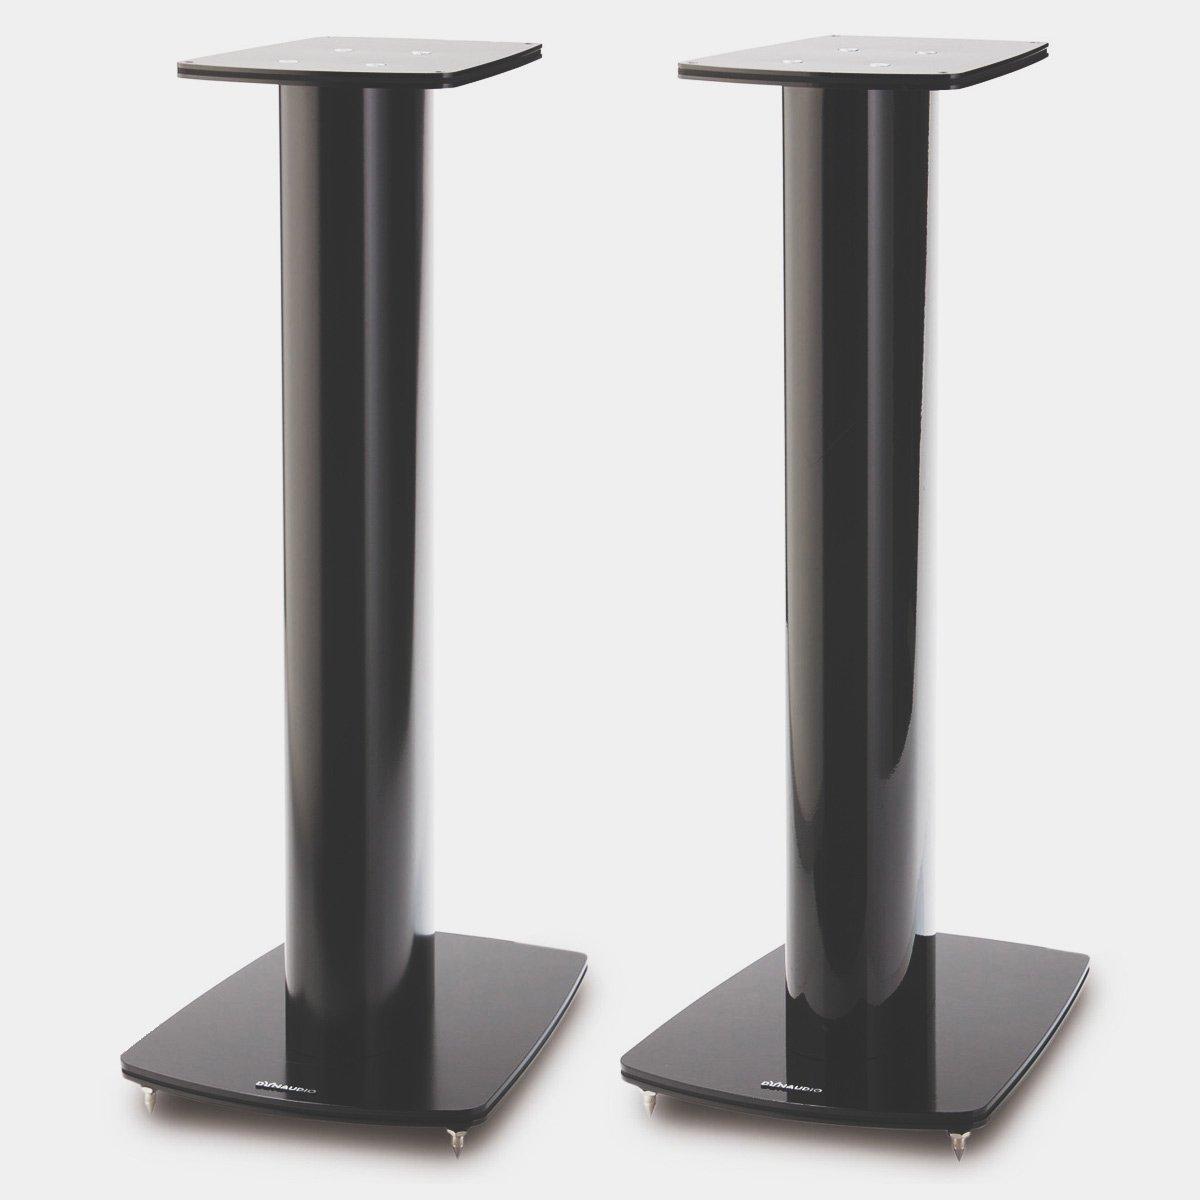 DYNAUDIO Stand 6 Speaker Stands - Pair (Satin Black) by DYNAUDIO